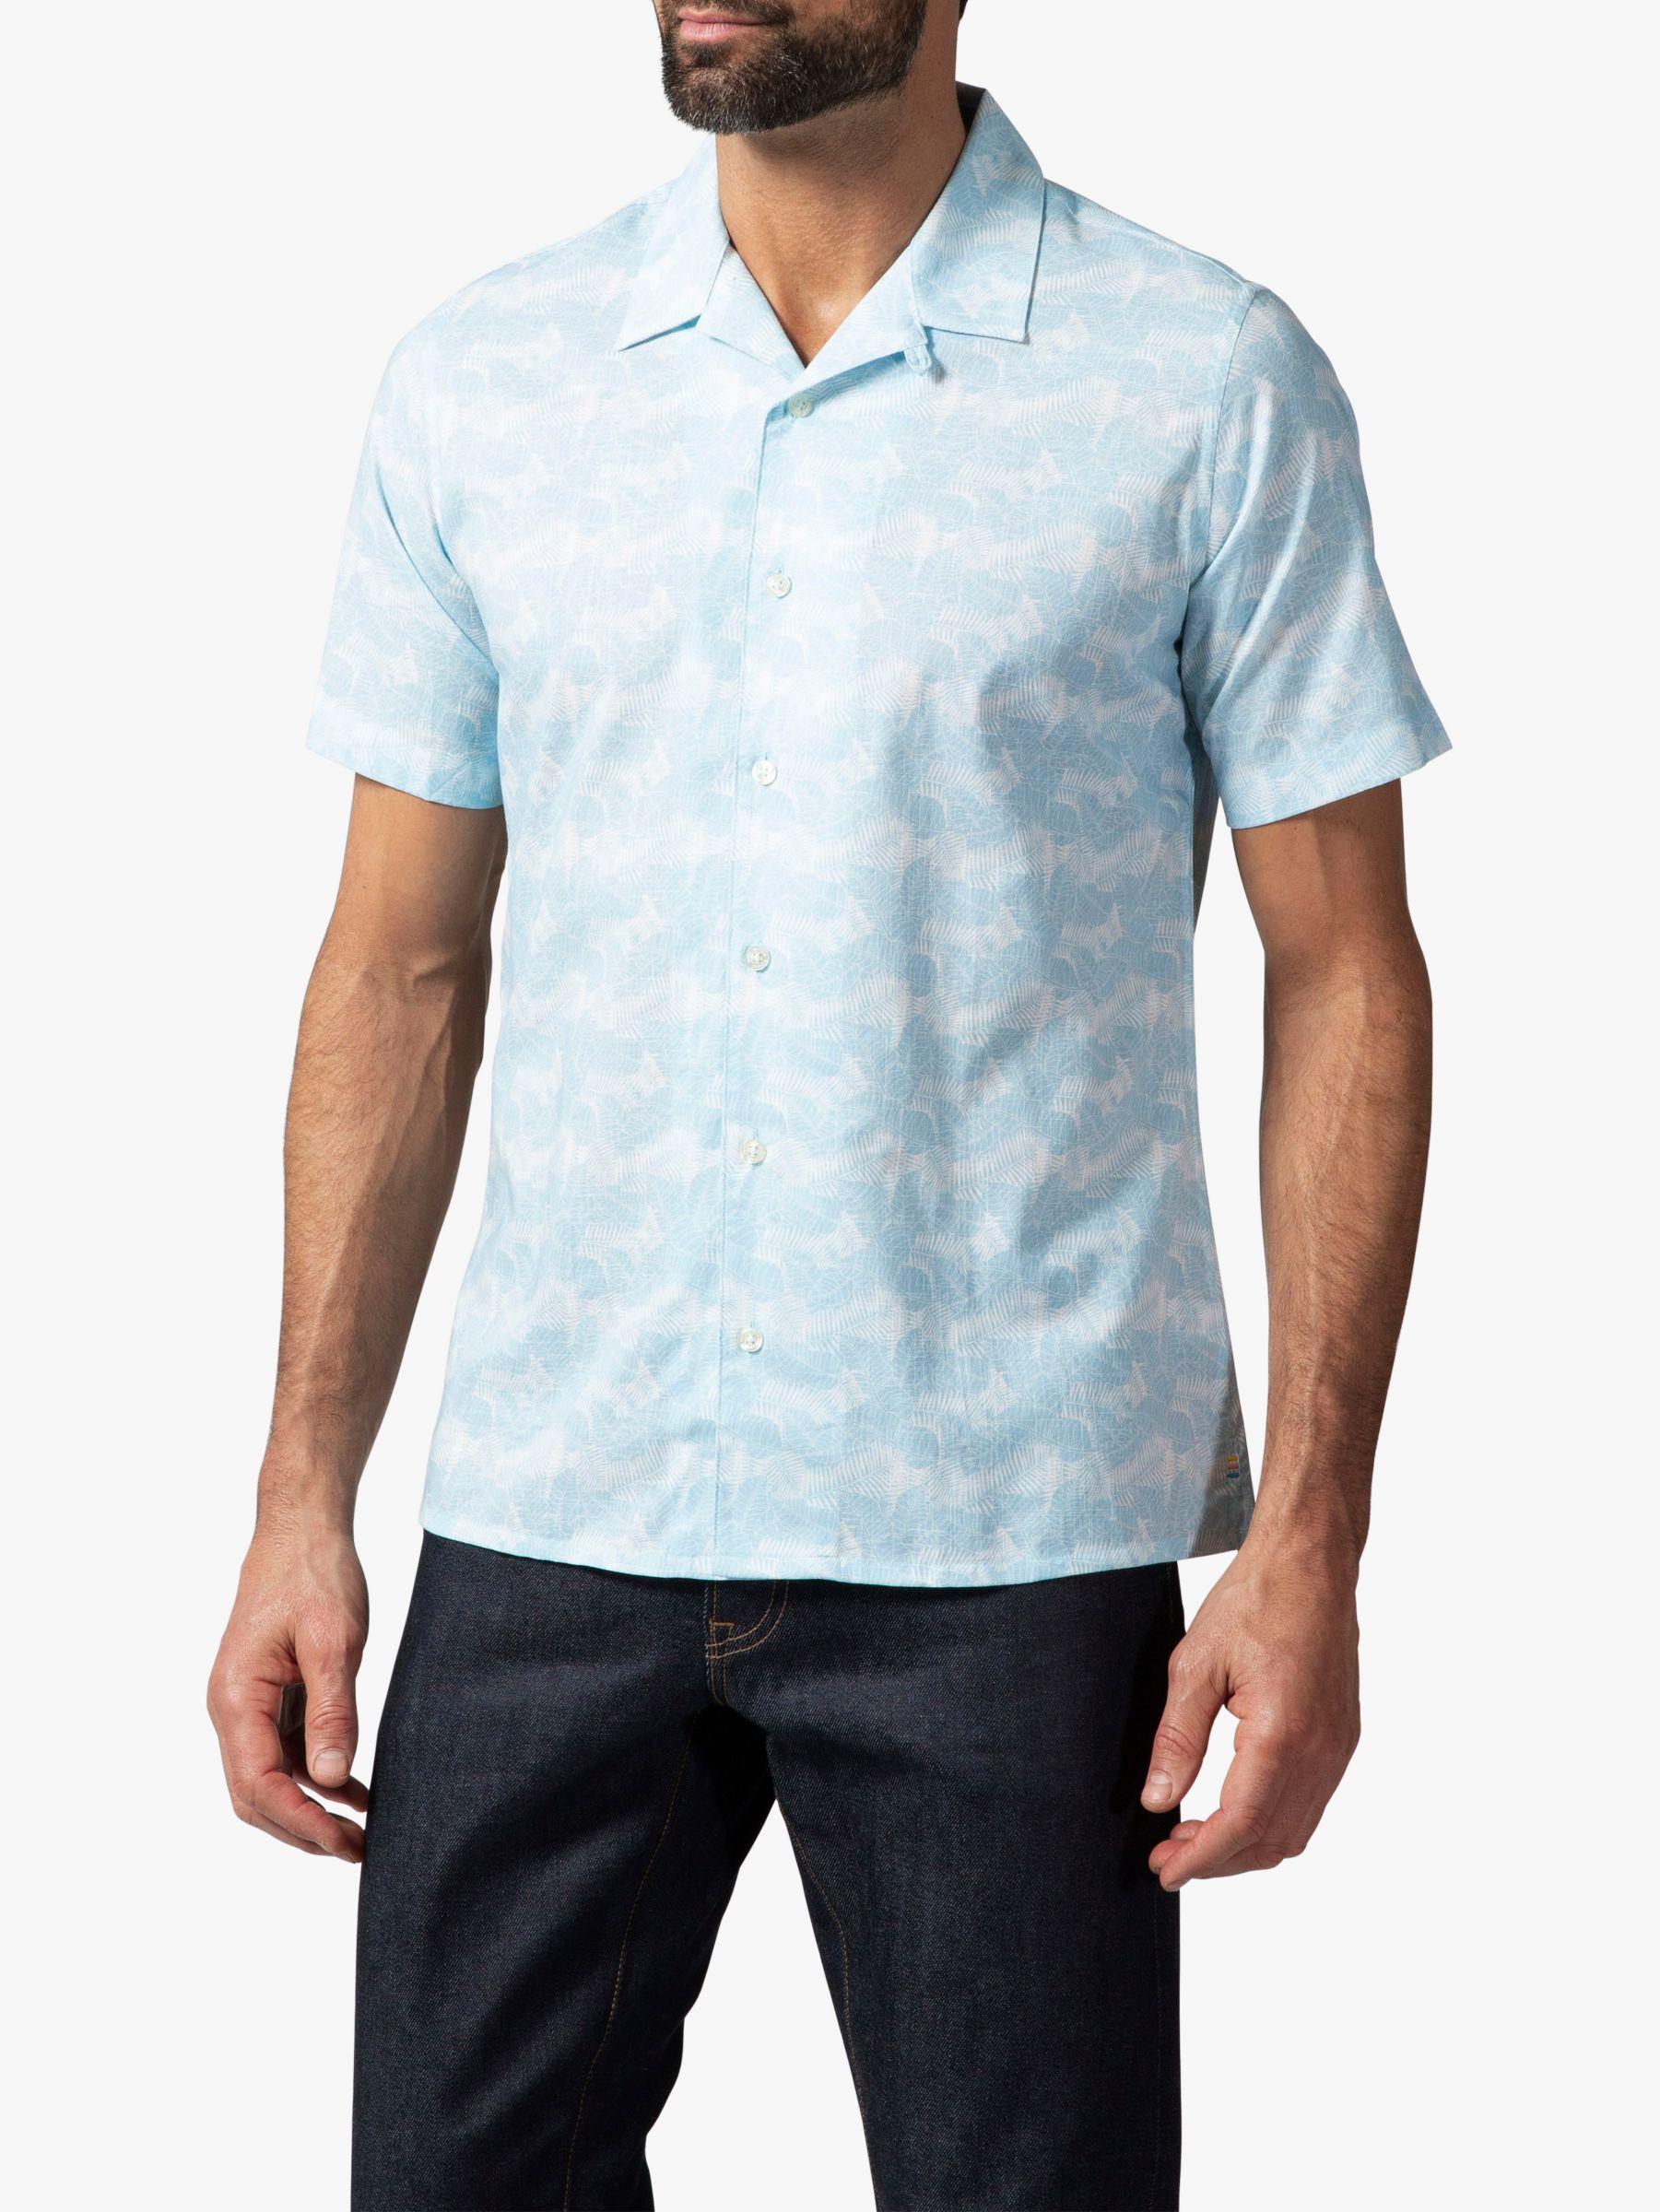 Richard James Mayfair Richard James Mayfair Tropical Leaf Cuban Collar Shirt, Sky